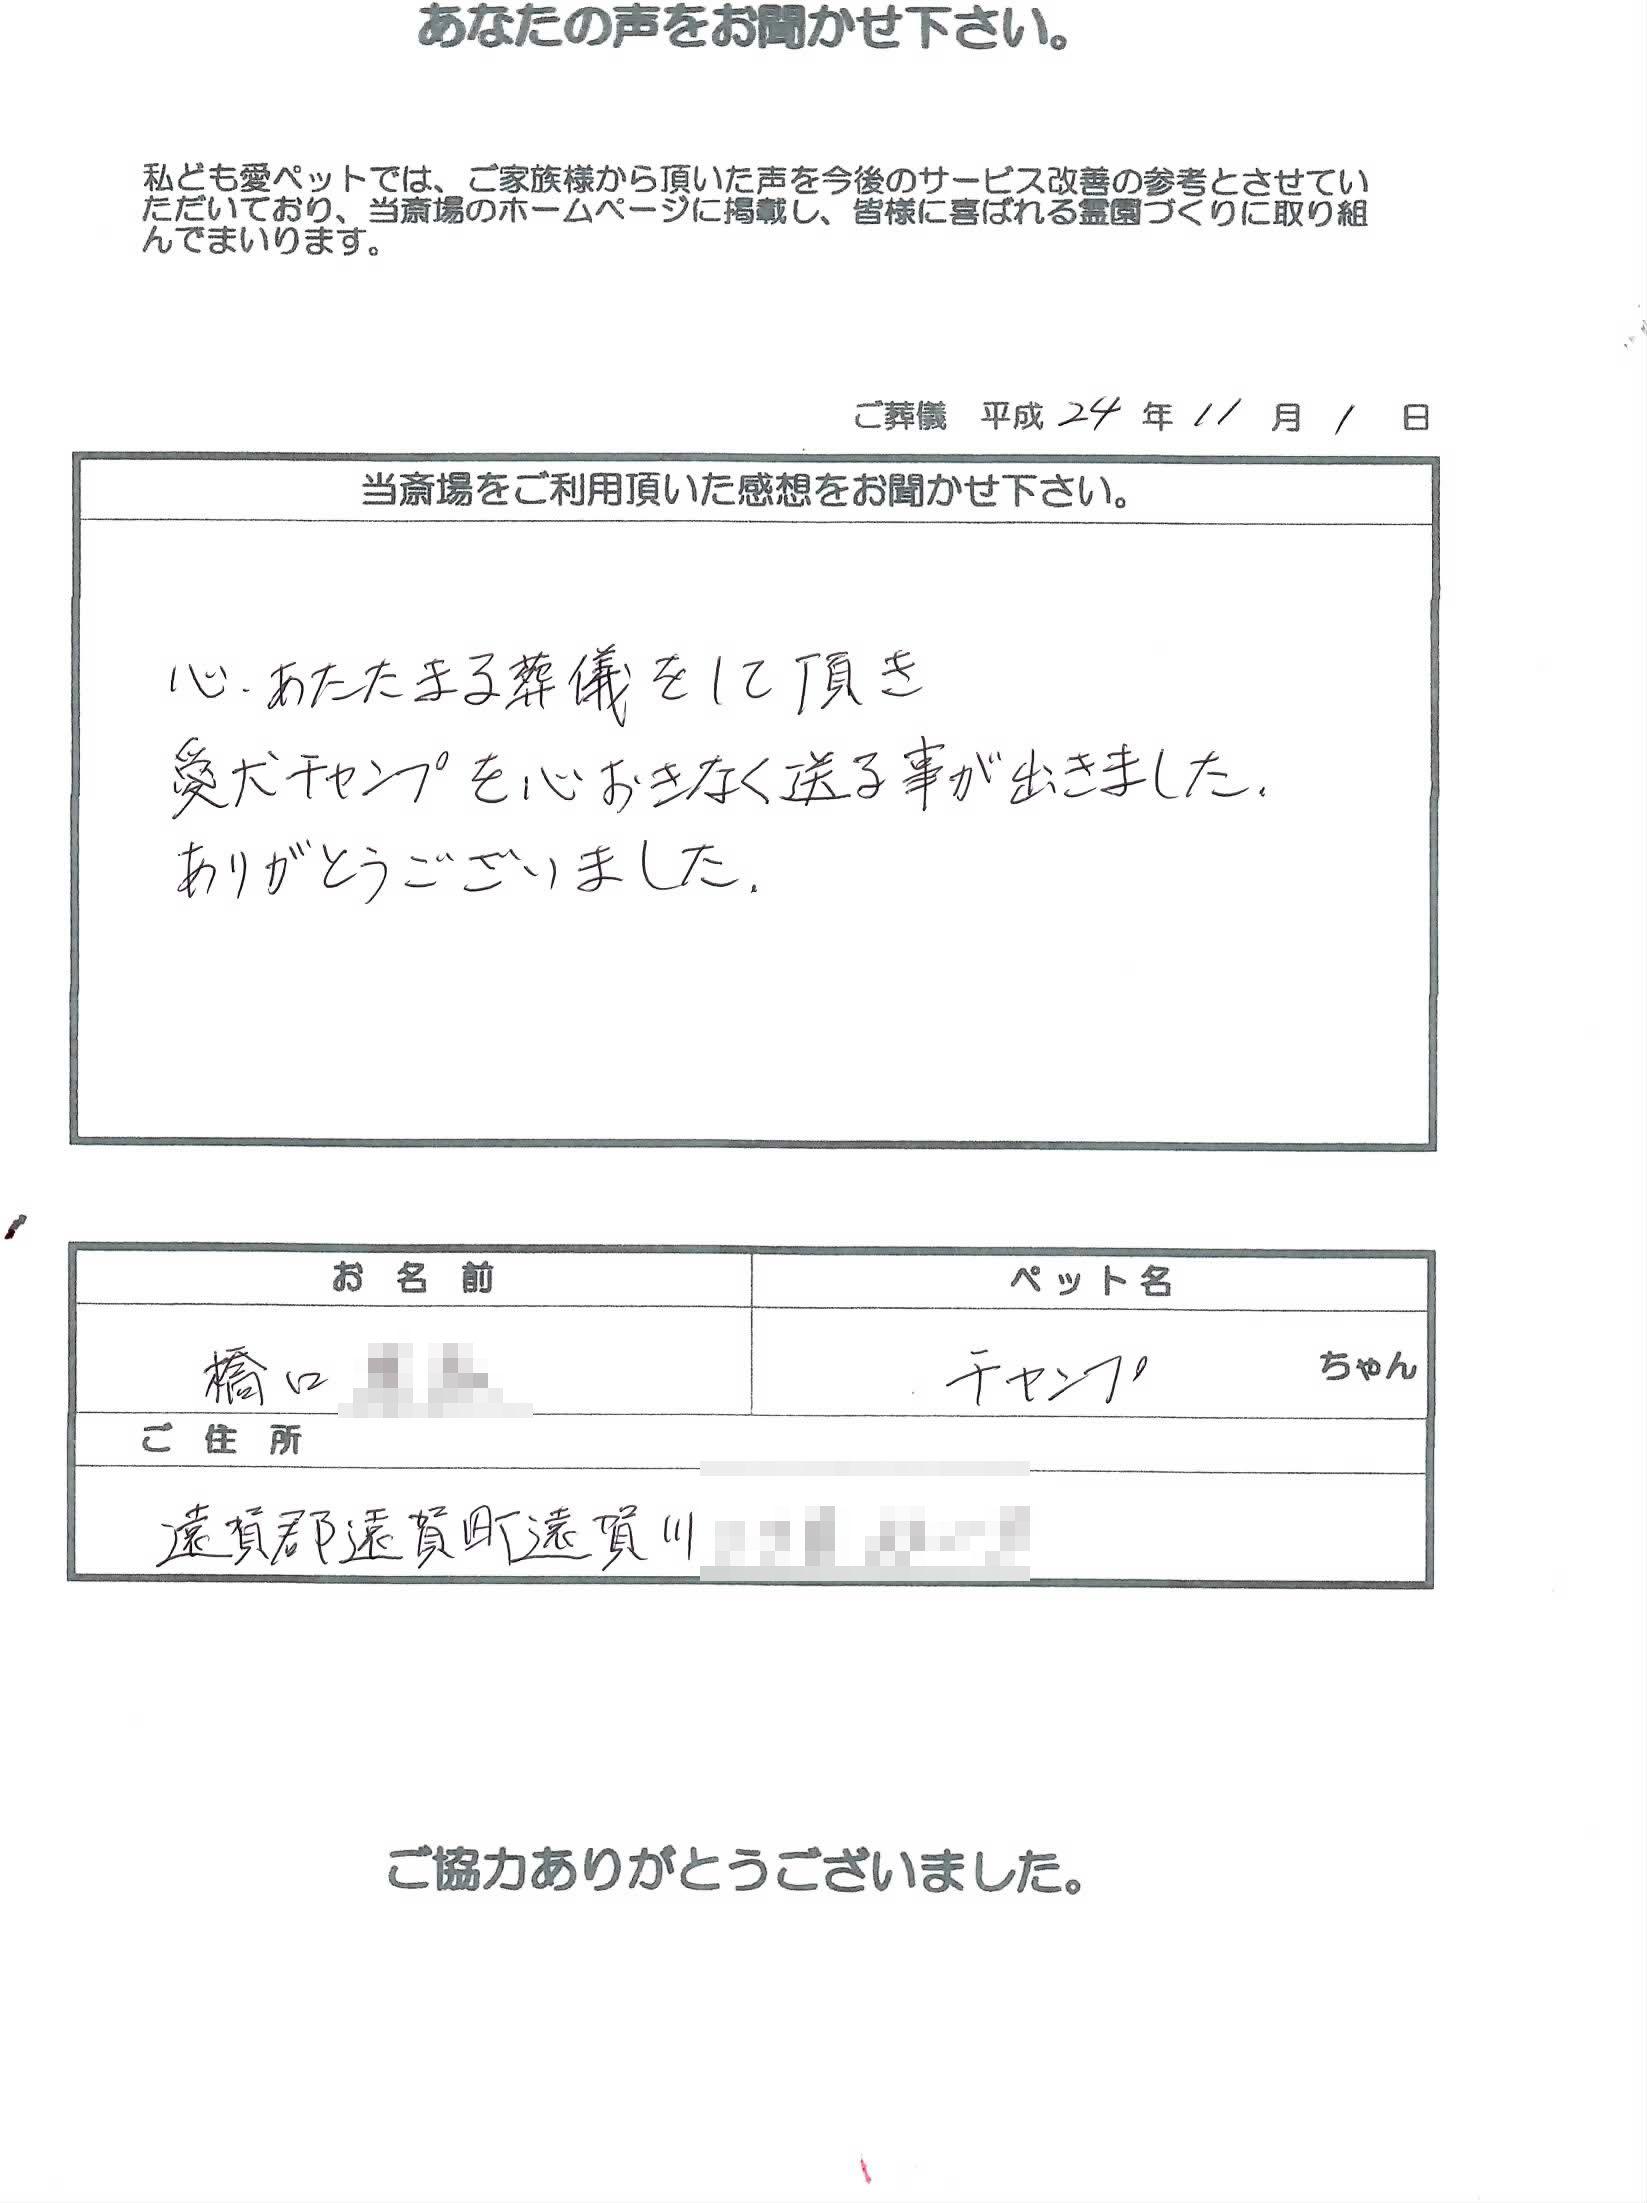 k121101-3.jpg